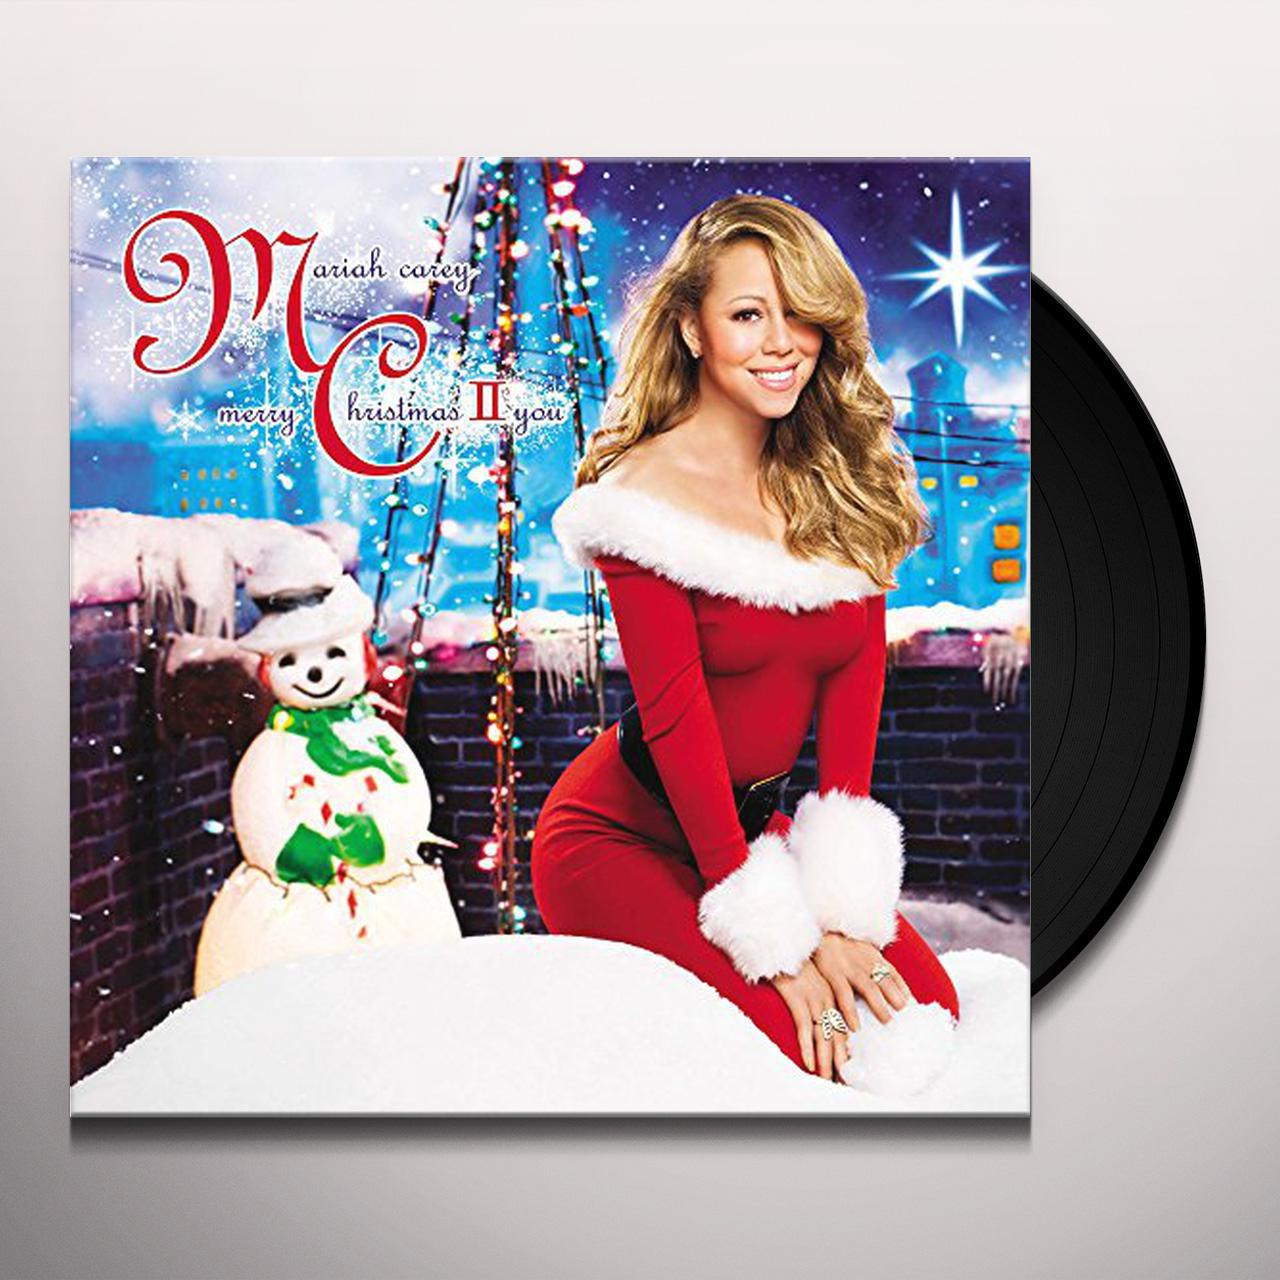 Mariah Carey Merry Christmas Ii You Vinyl Record